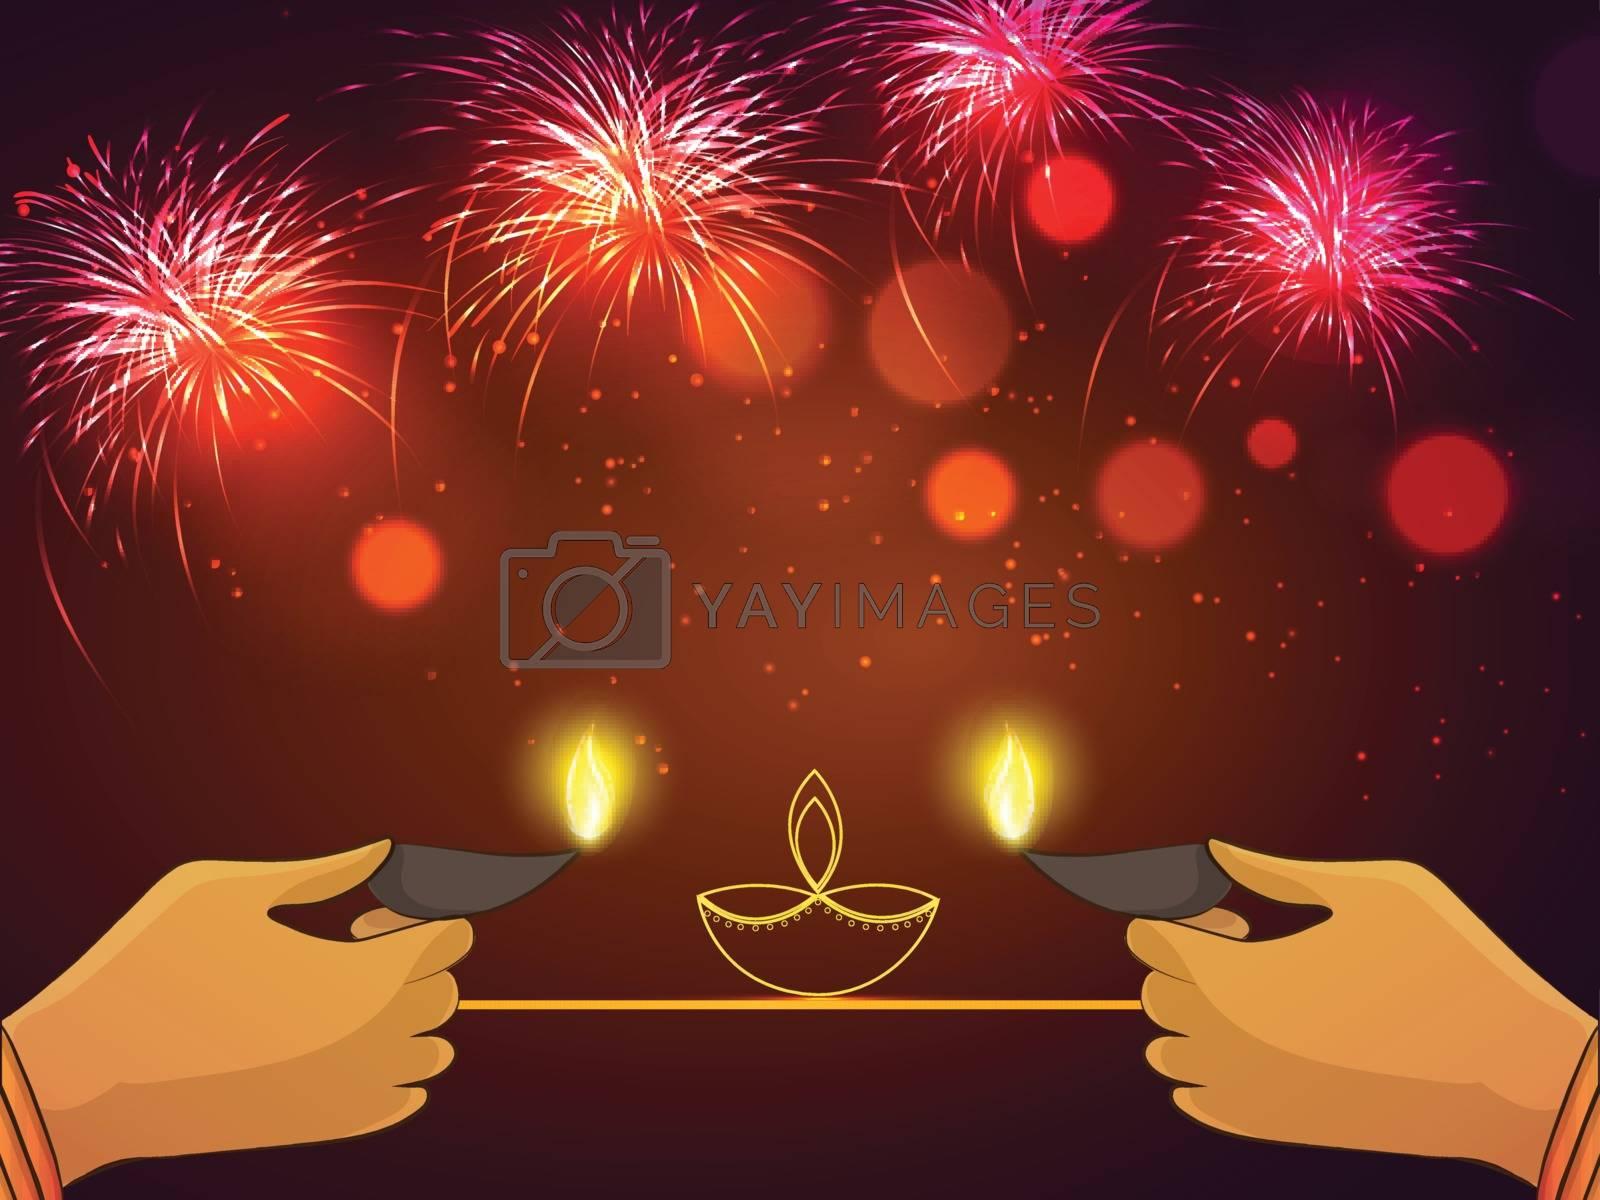 Women's hand holding illuminated Oil Lamps (Diya) on shiny fireworks background for Indian Festival of Lights, Happy Diwali celebration.